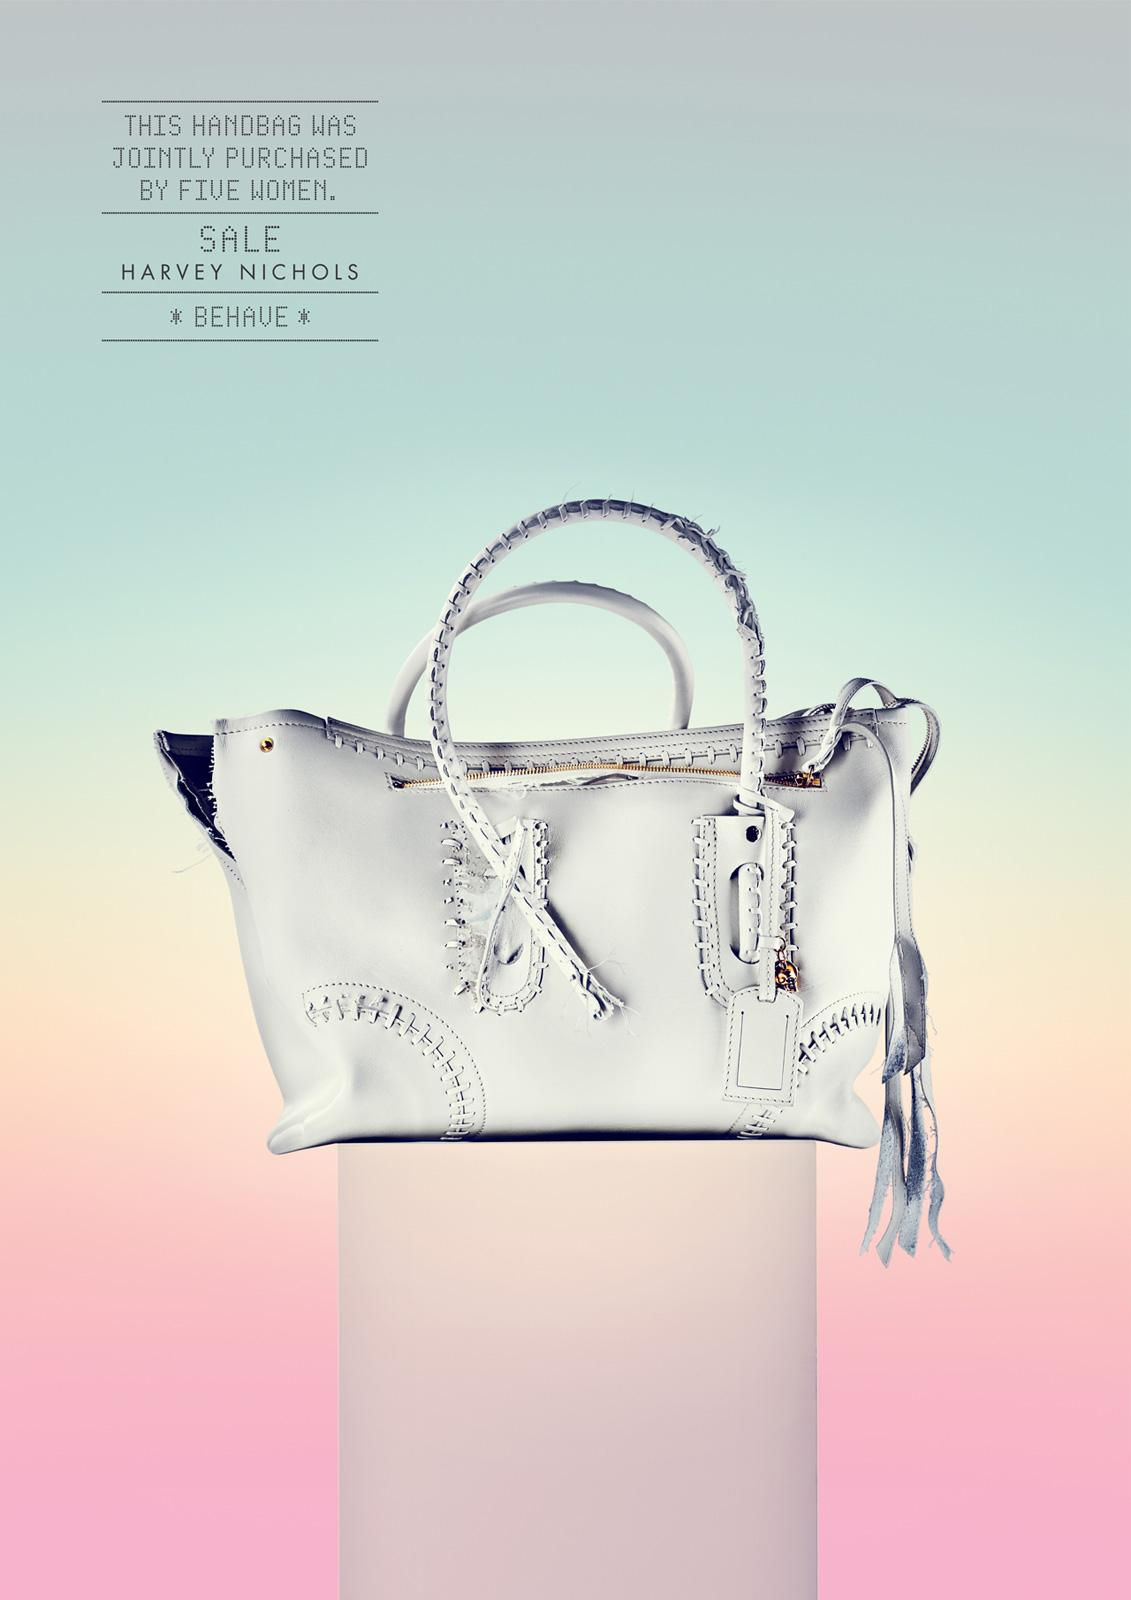 Harvey Nichols Print Ad -  Behave, Handbag